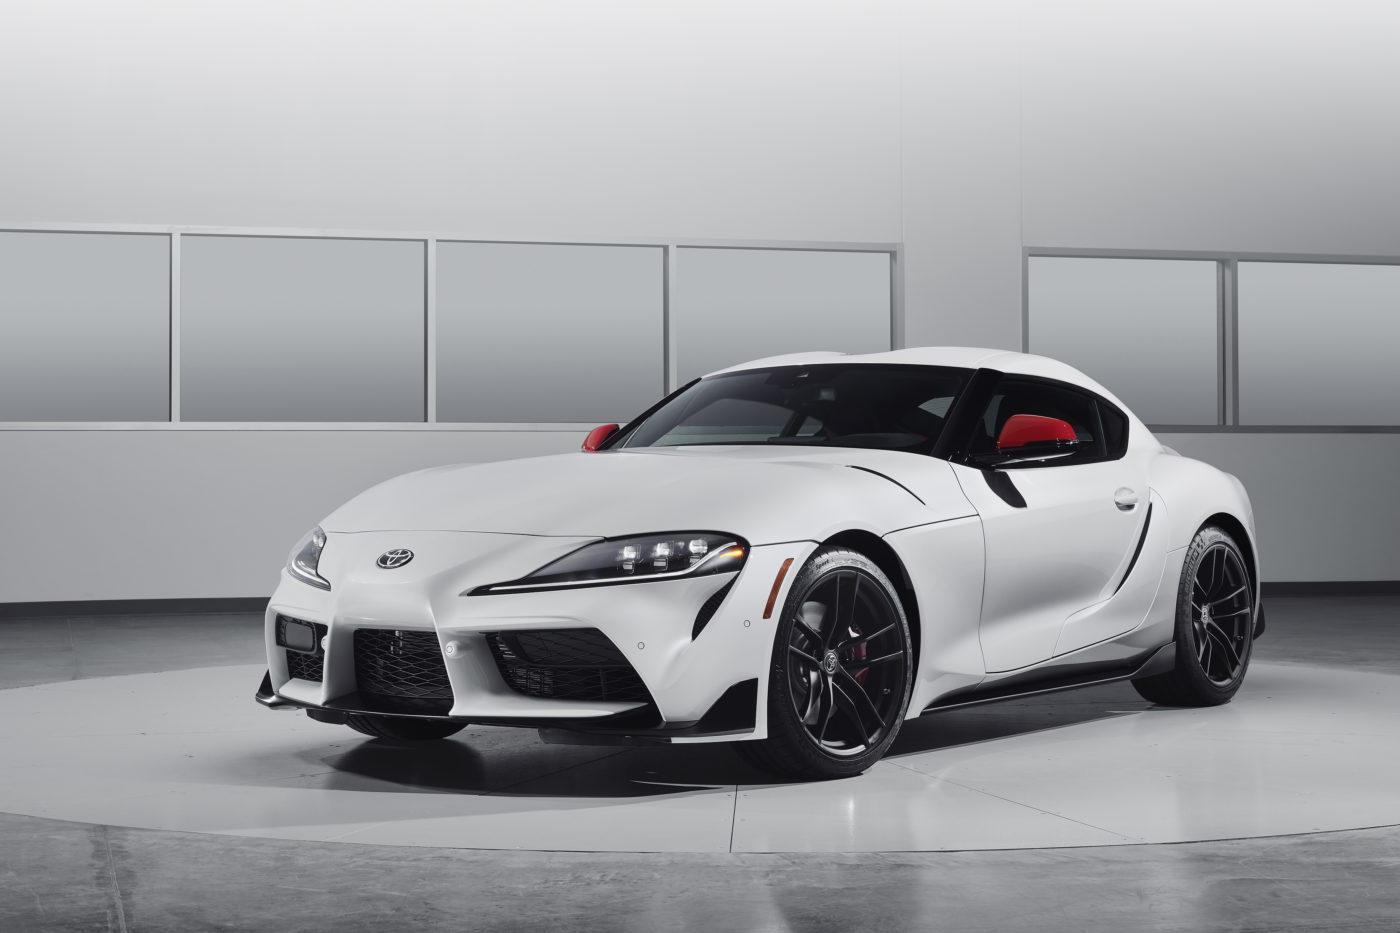 New Supra 2020 2020 Toyota Supra Price, Specs, Photos, & Review